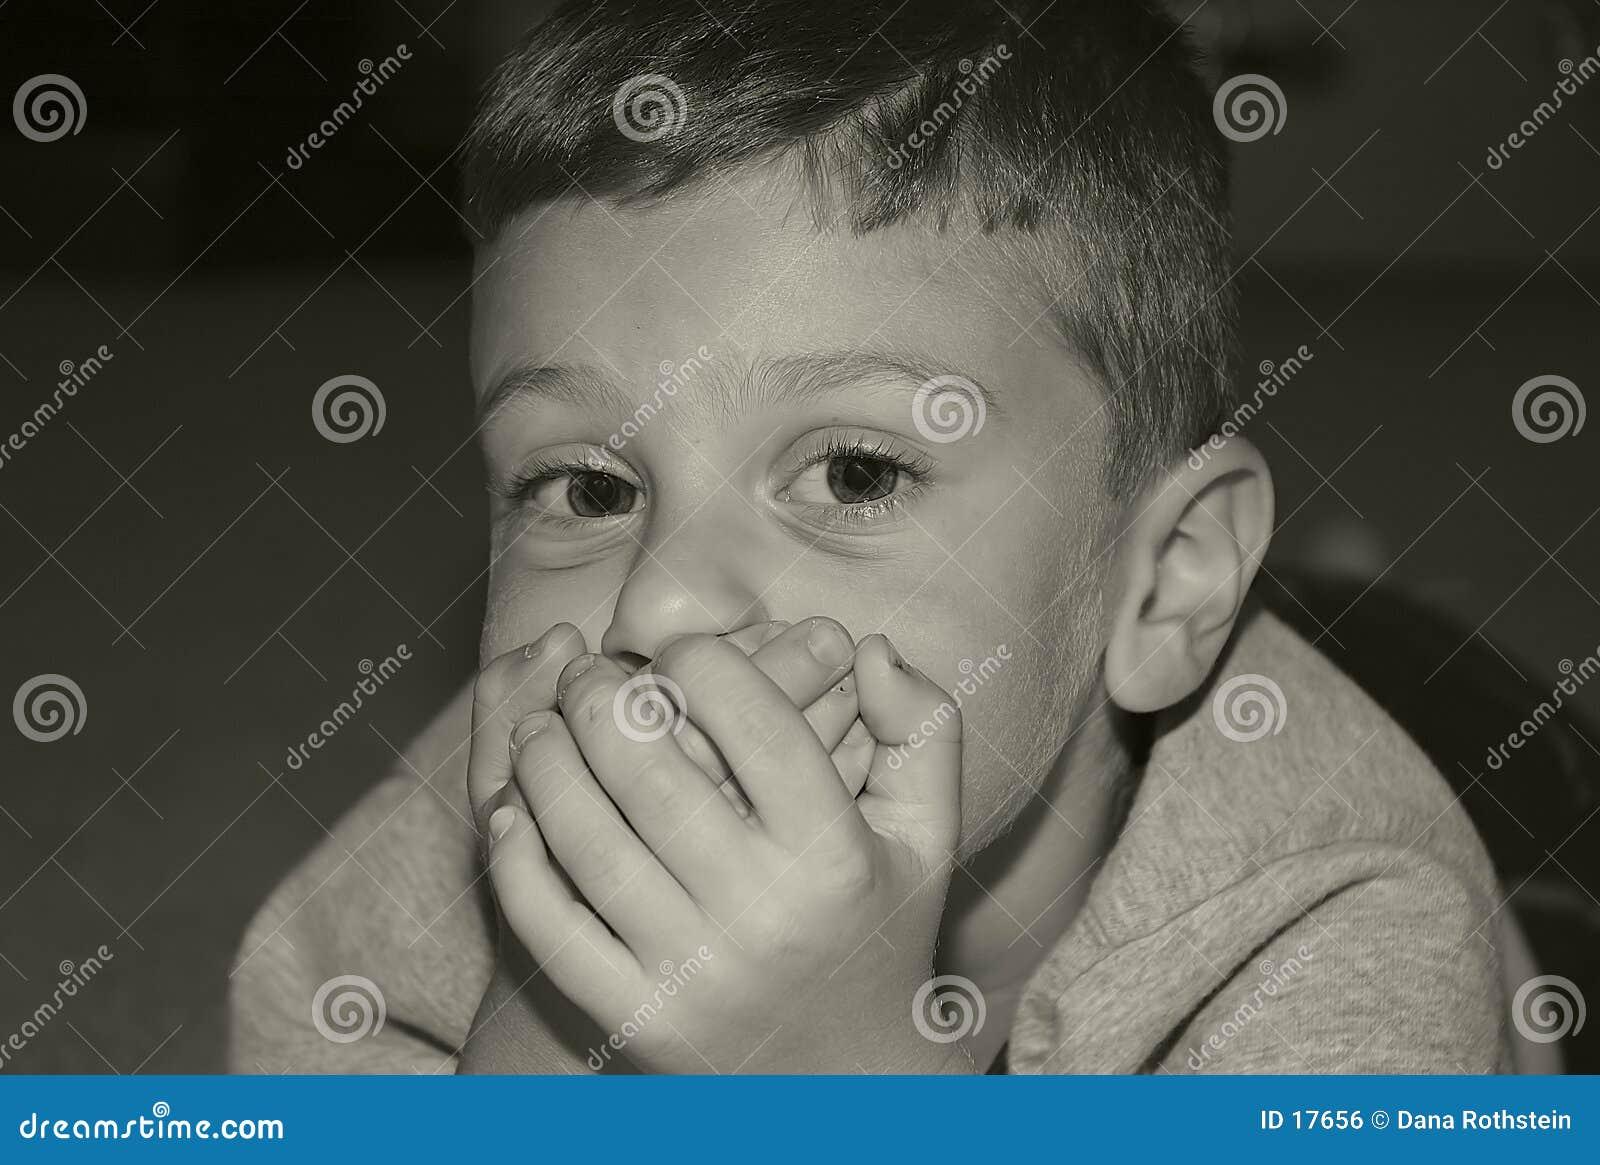 Boca da coberta da criança